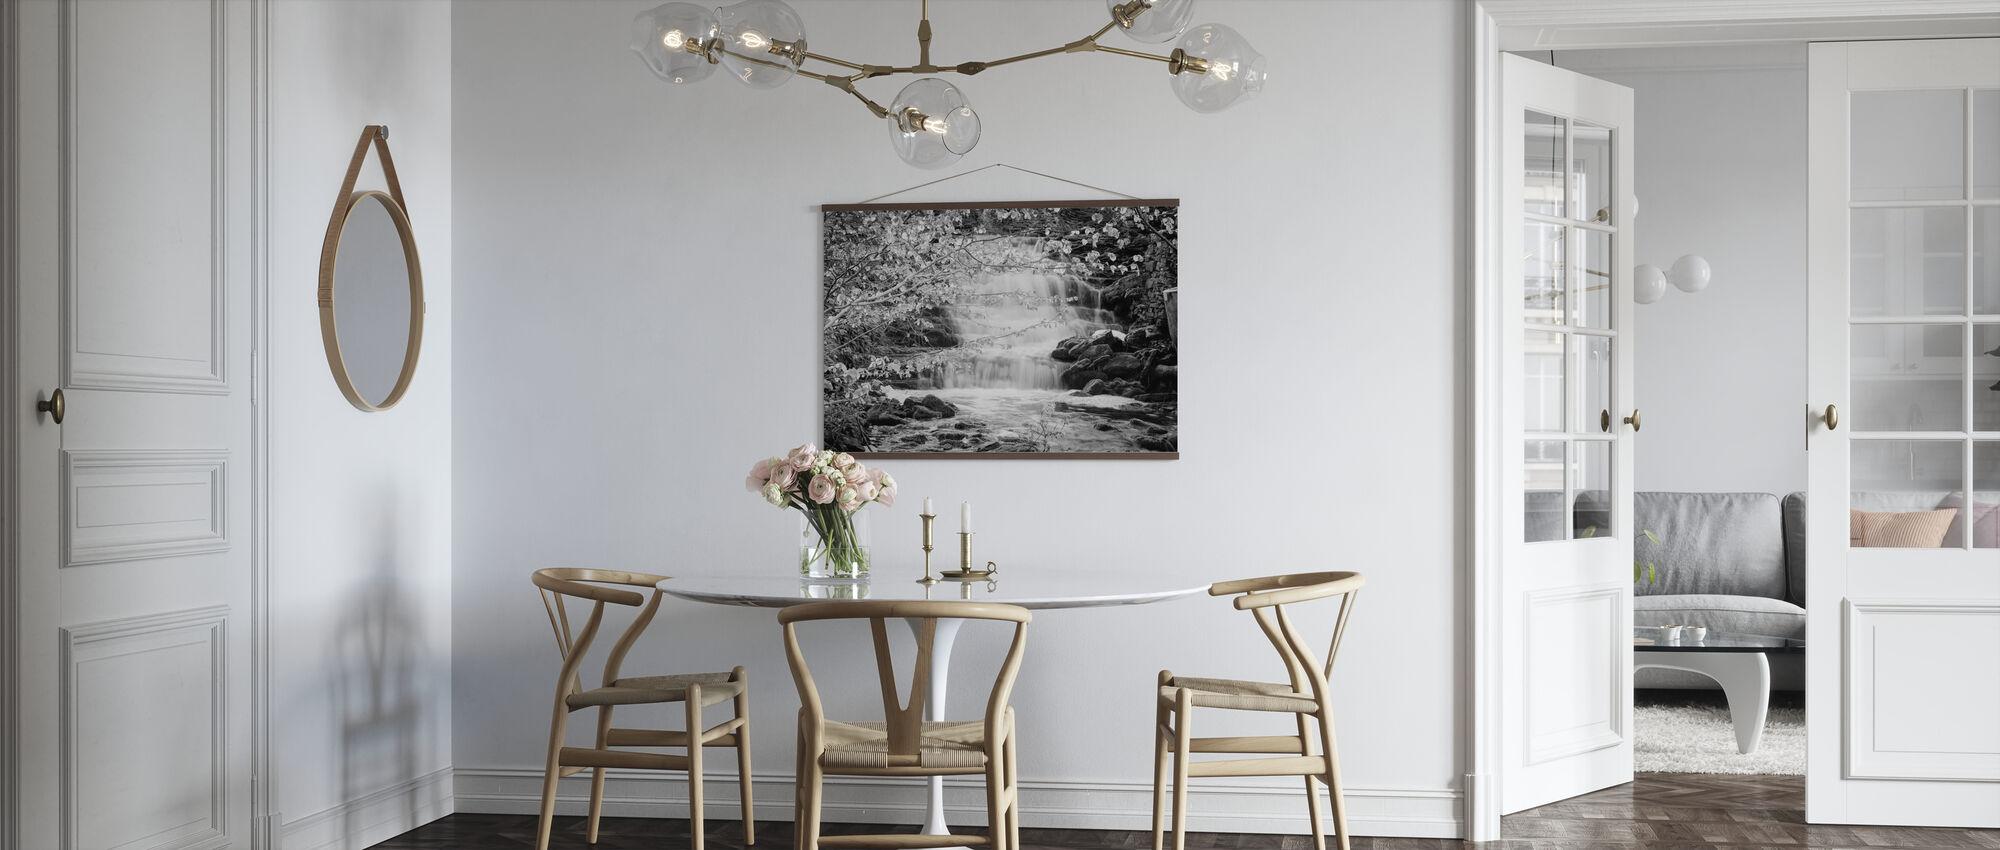 Lummelunda Waterwall - Poster - Kök